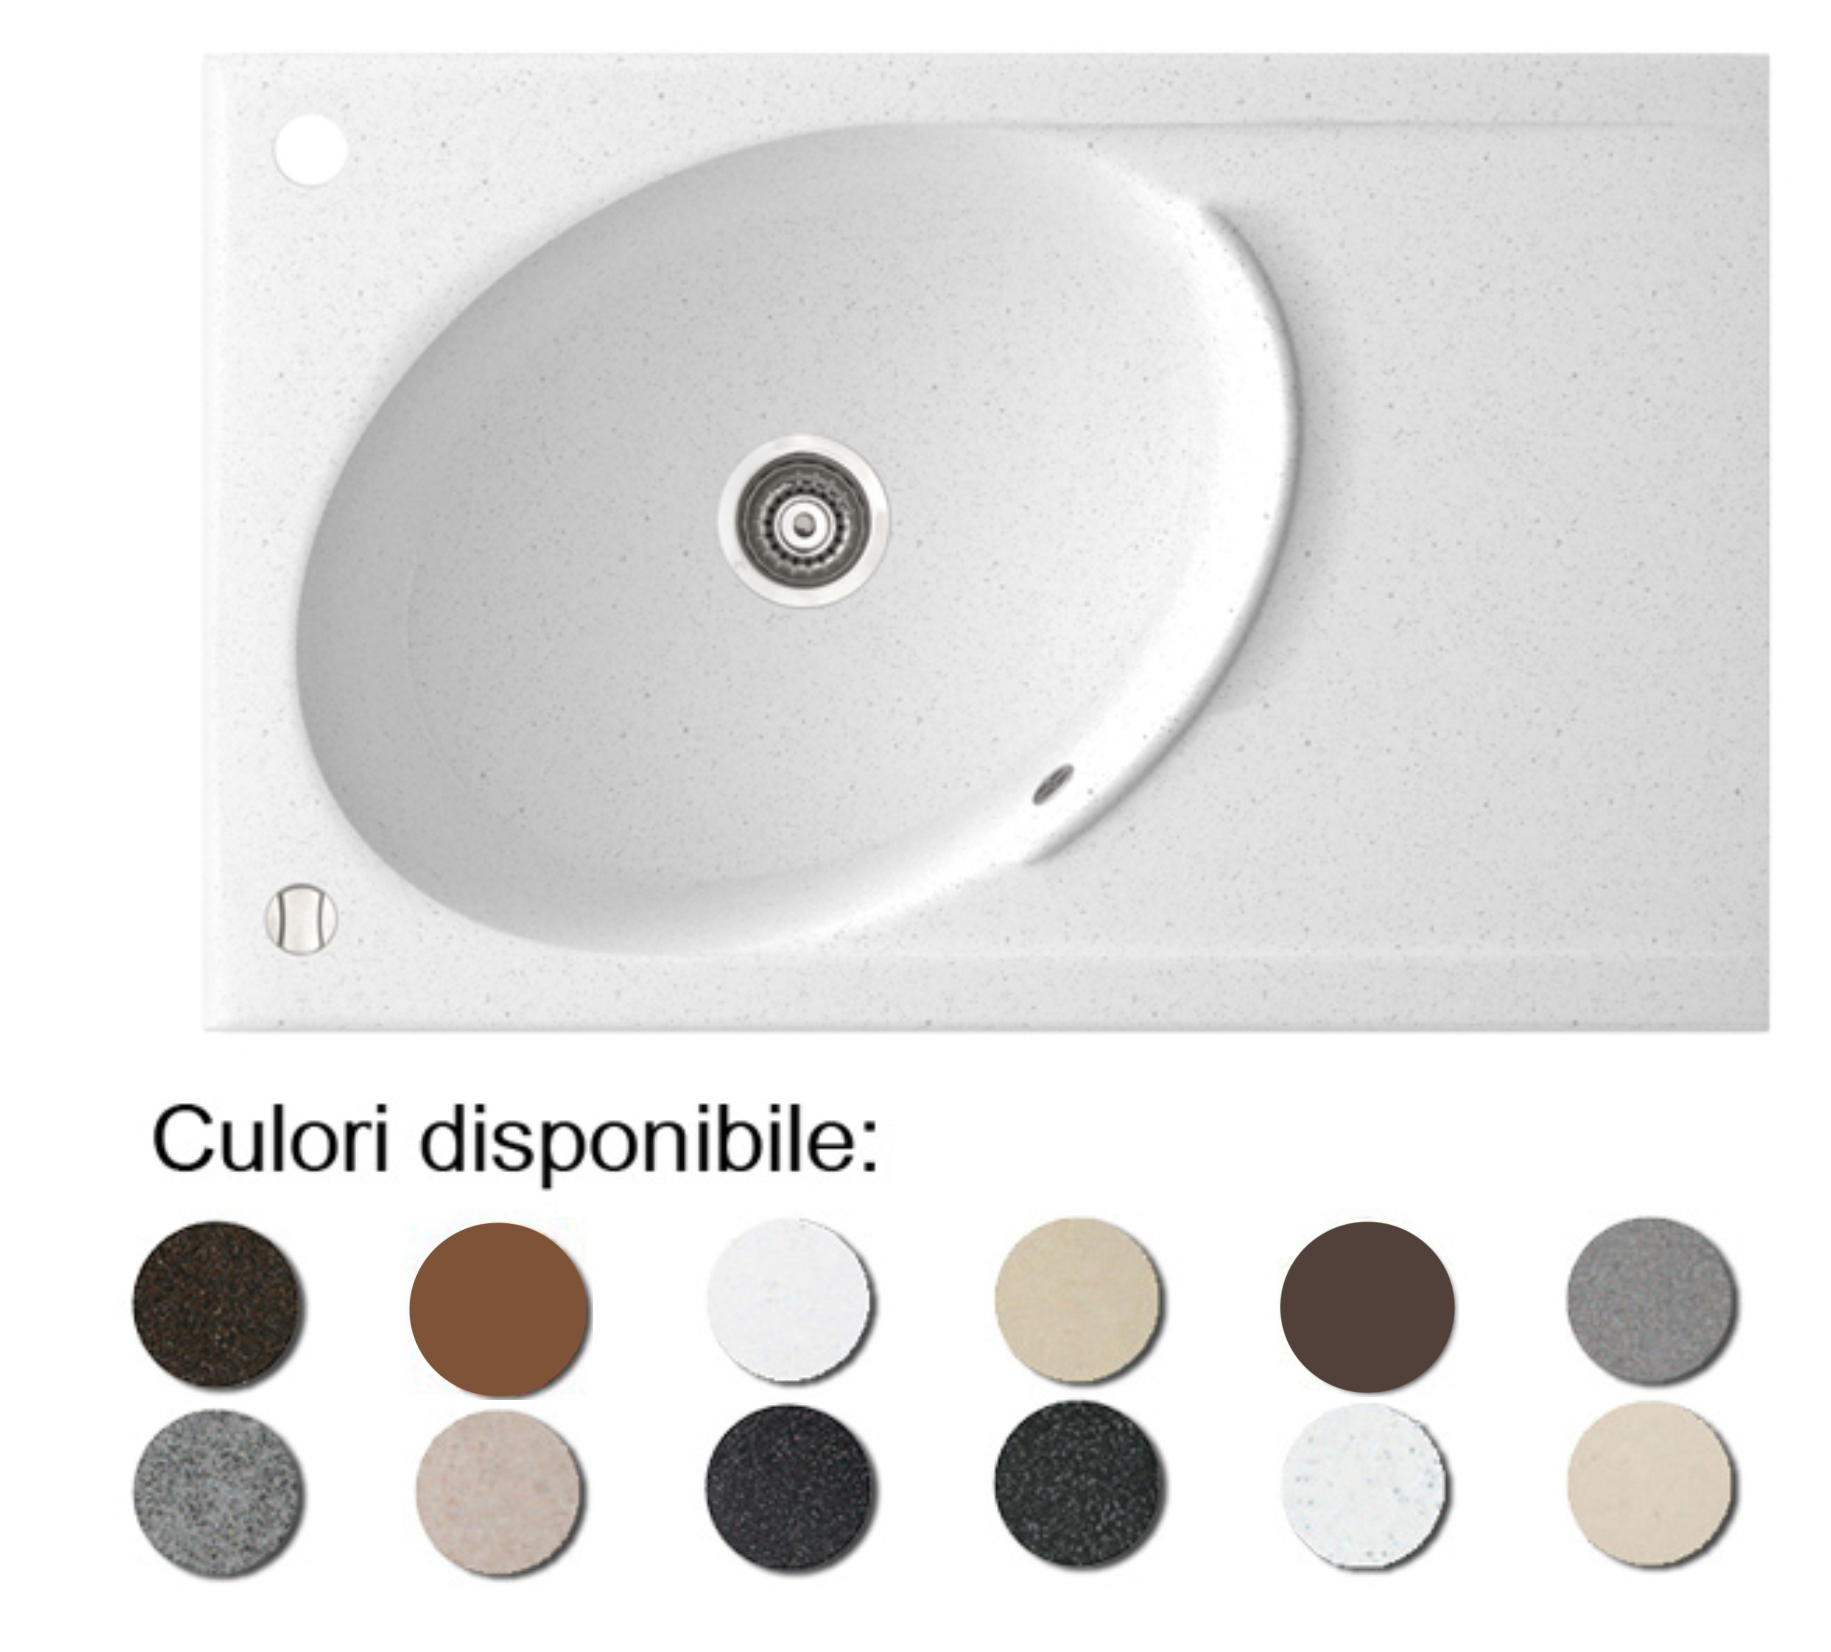 Chiuveta Bucatarie Granit Compozit Anticalcar Cuva Ovala Picurator Imagine